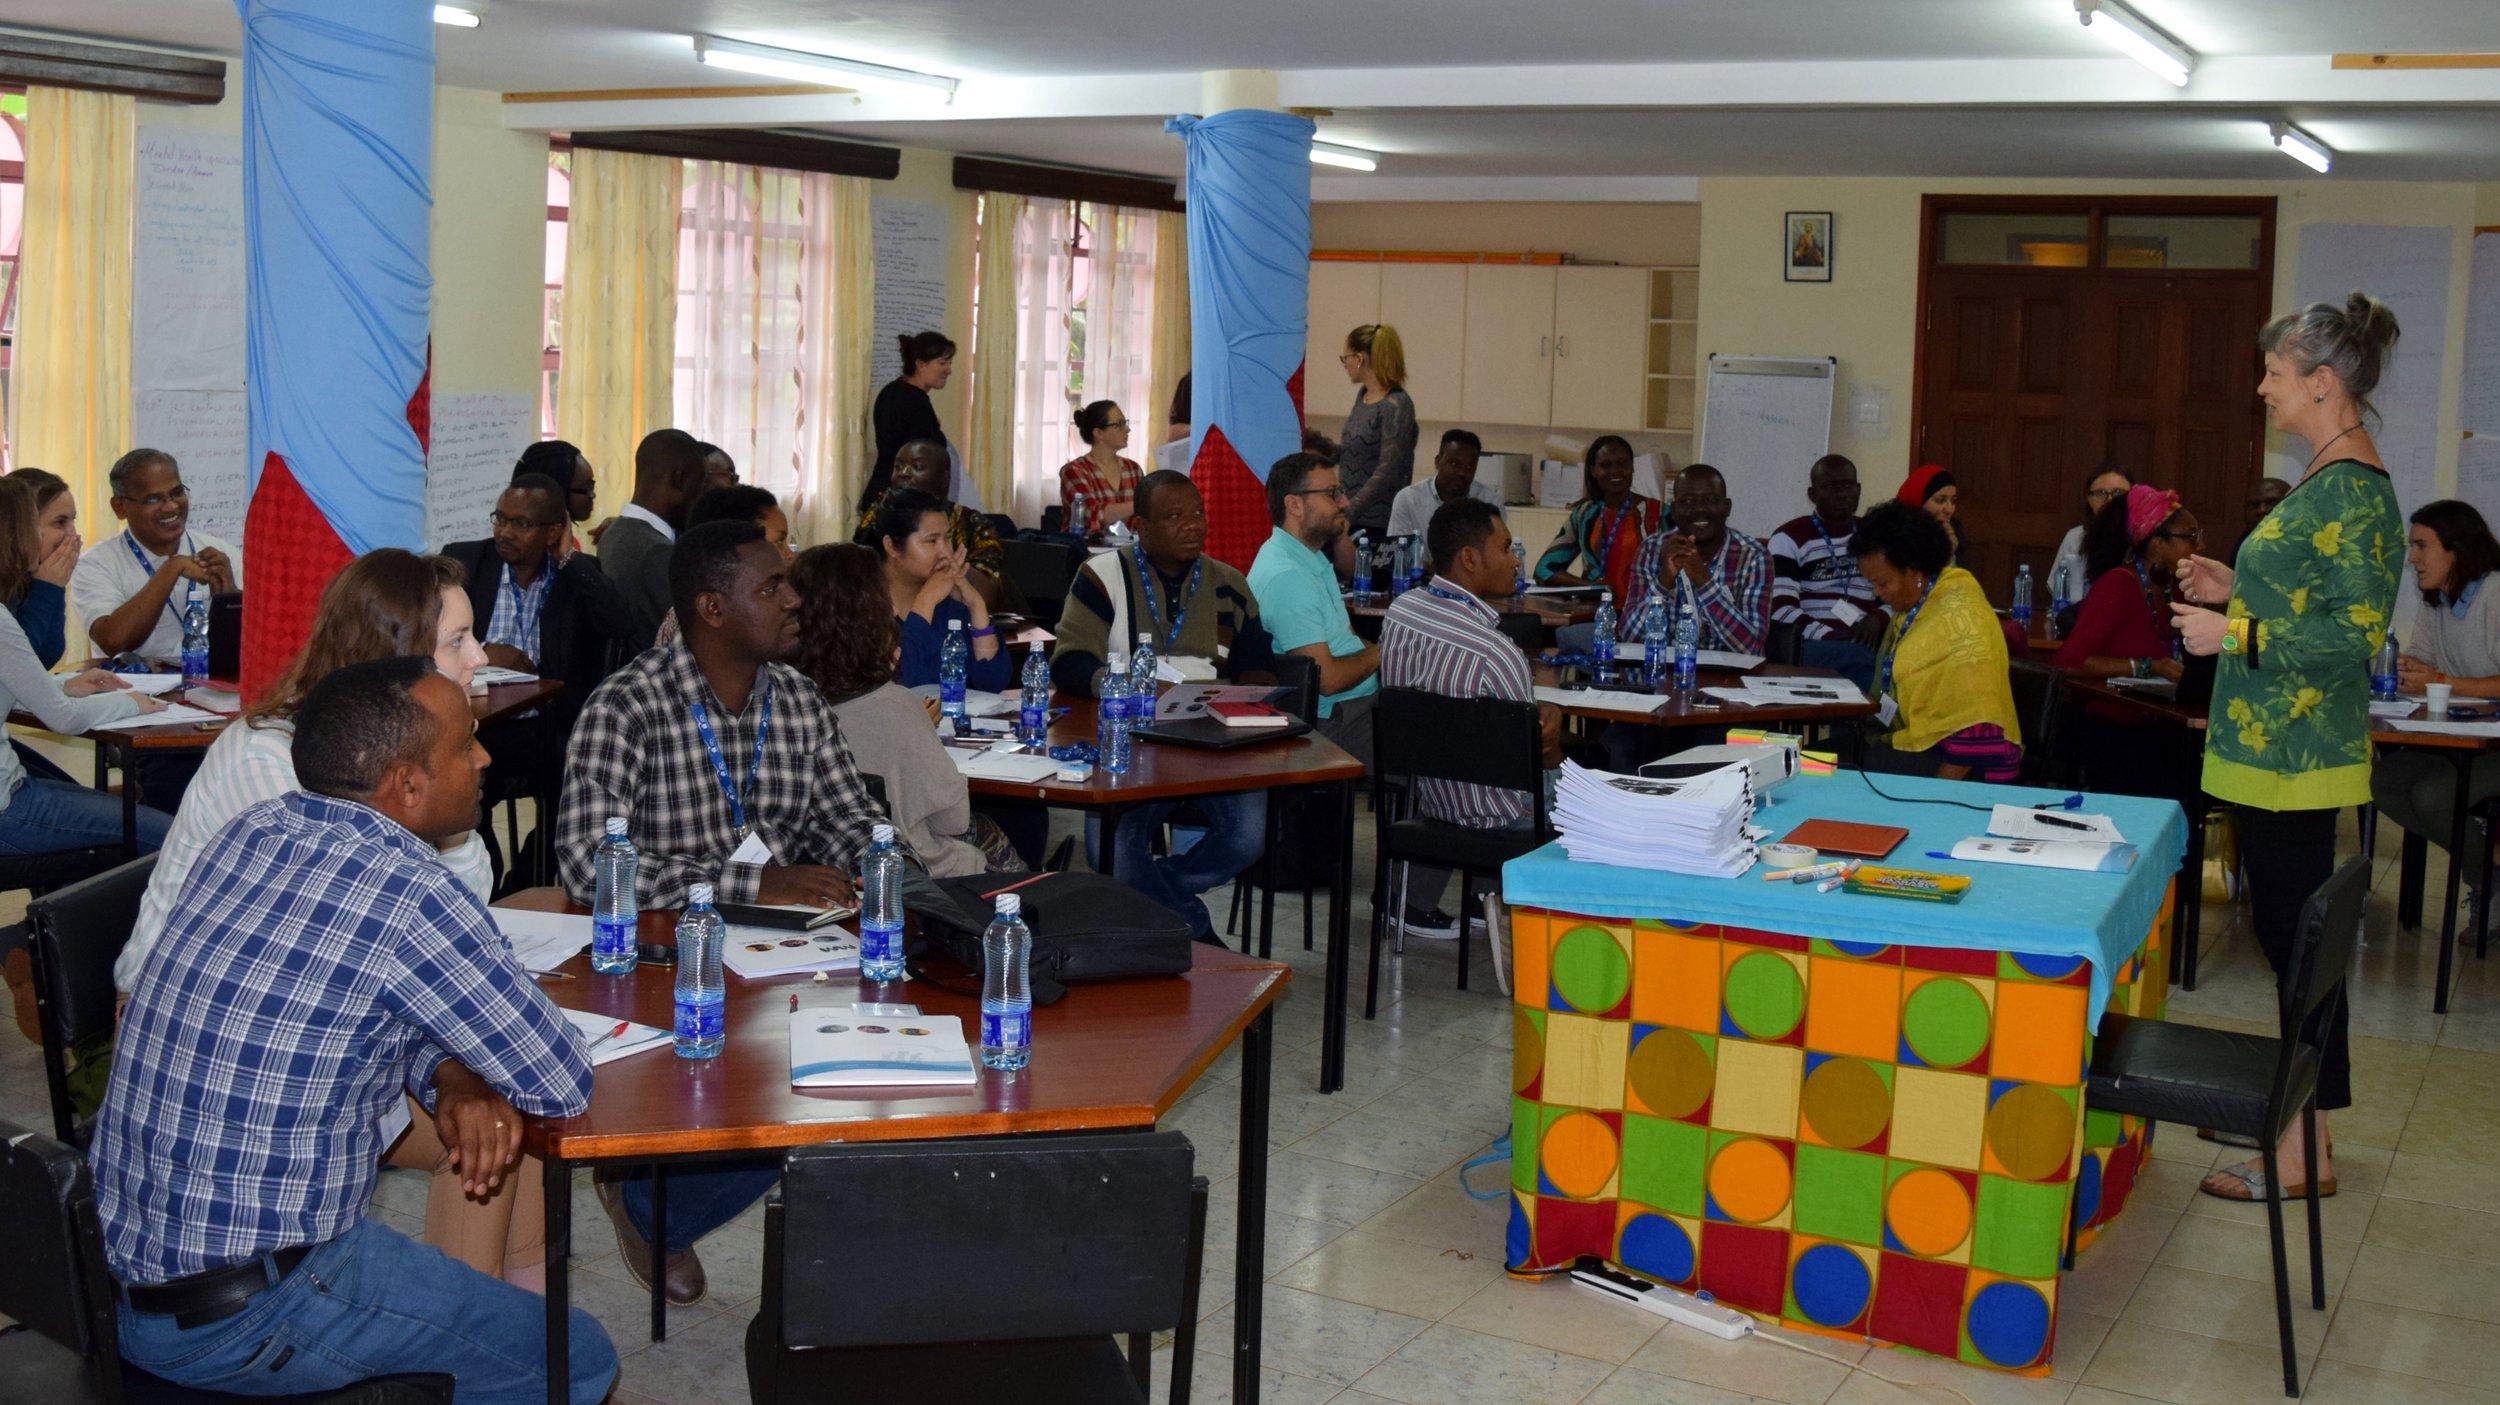 Jesuit Refugee Service mental health and psychosocial support workshop in Nairobi